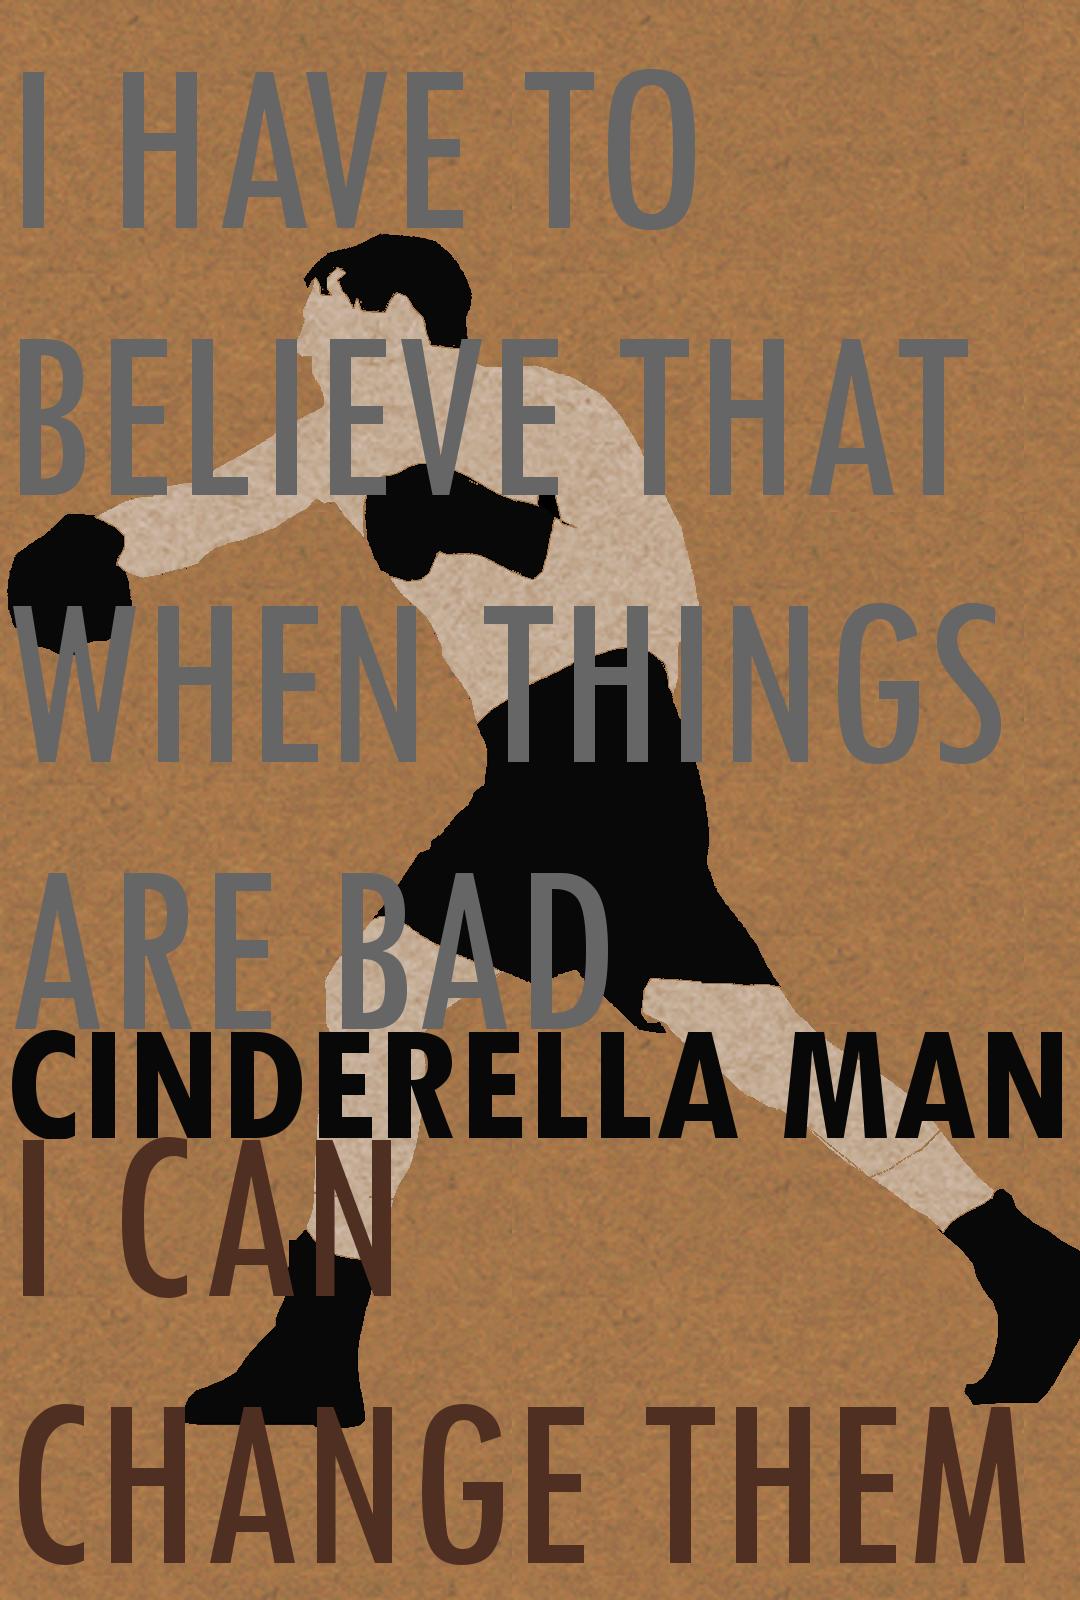 Cinderella Man Quotes Cinderella Man Minimalist Poster  Movies  Moviesal  Pinterest .